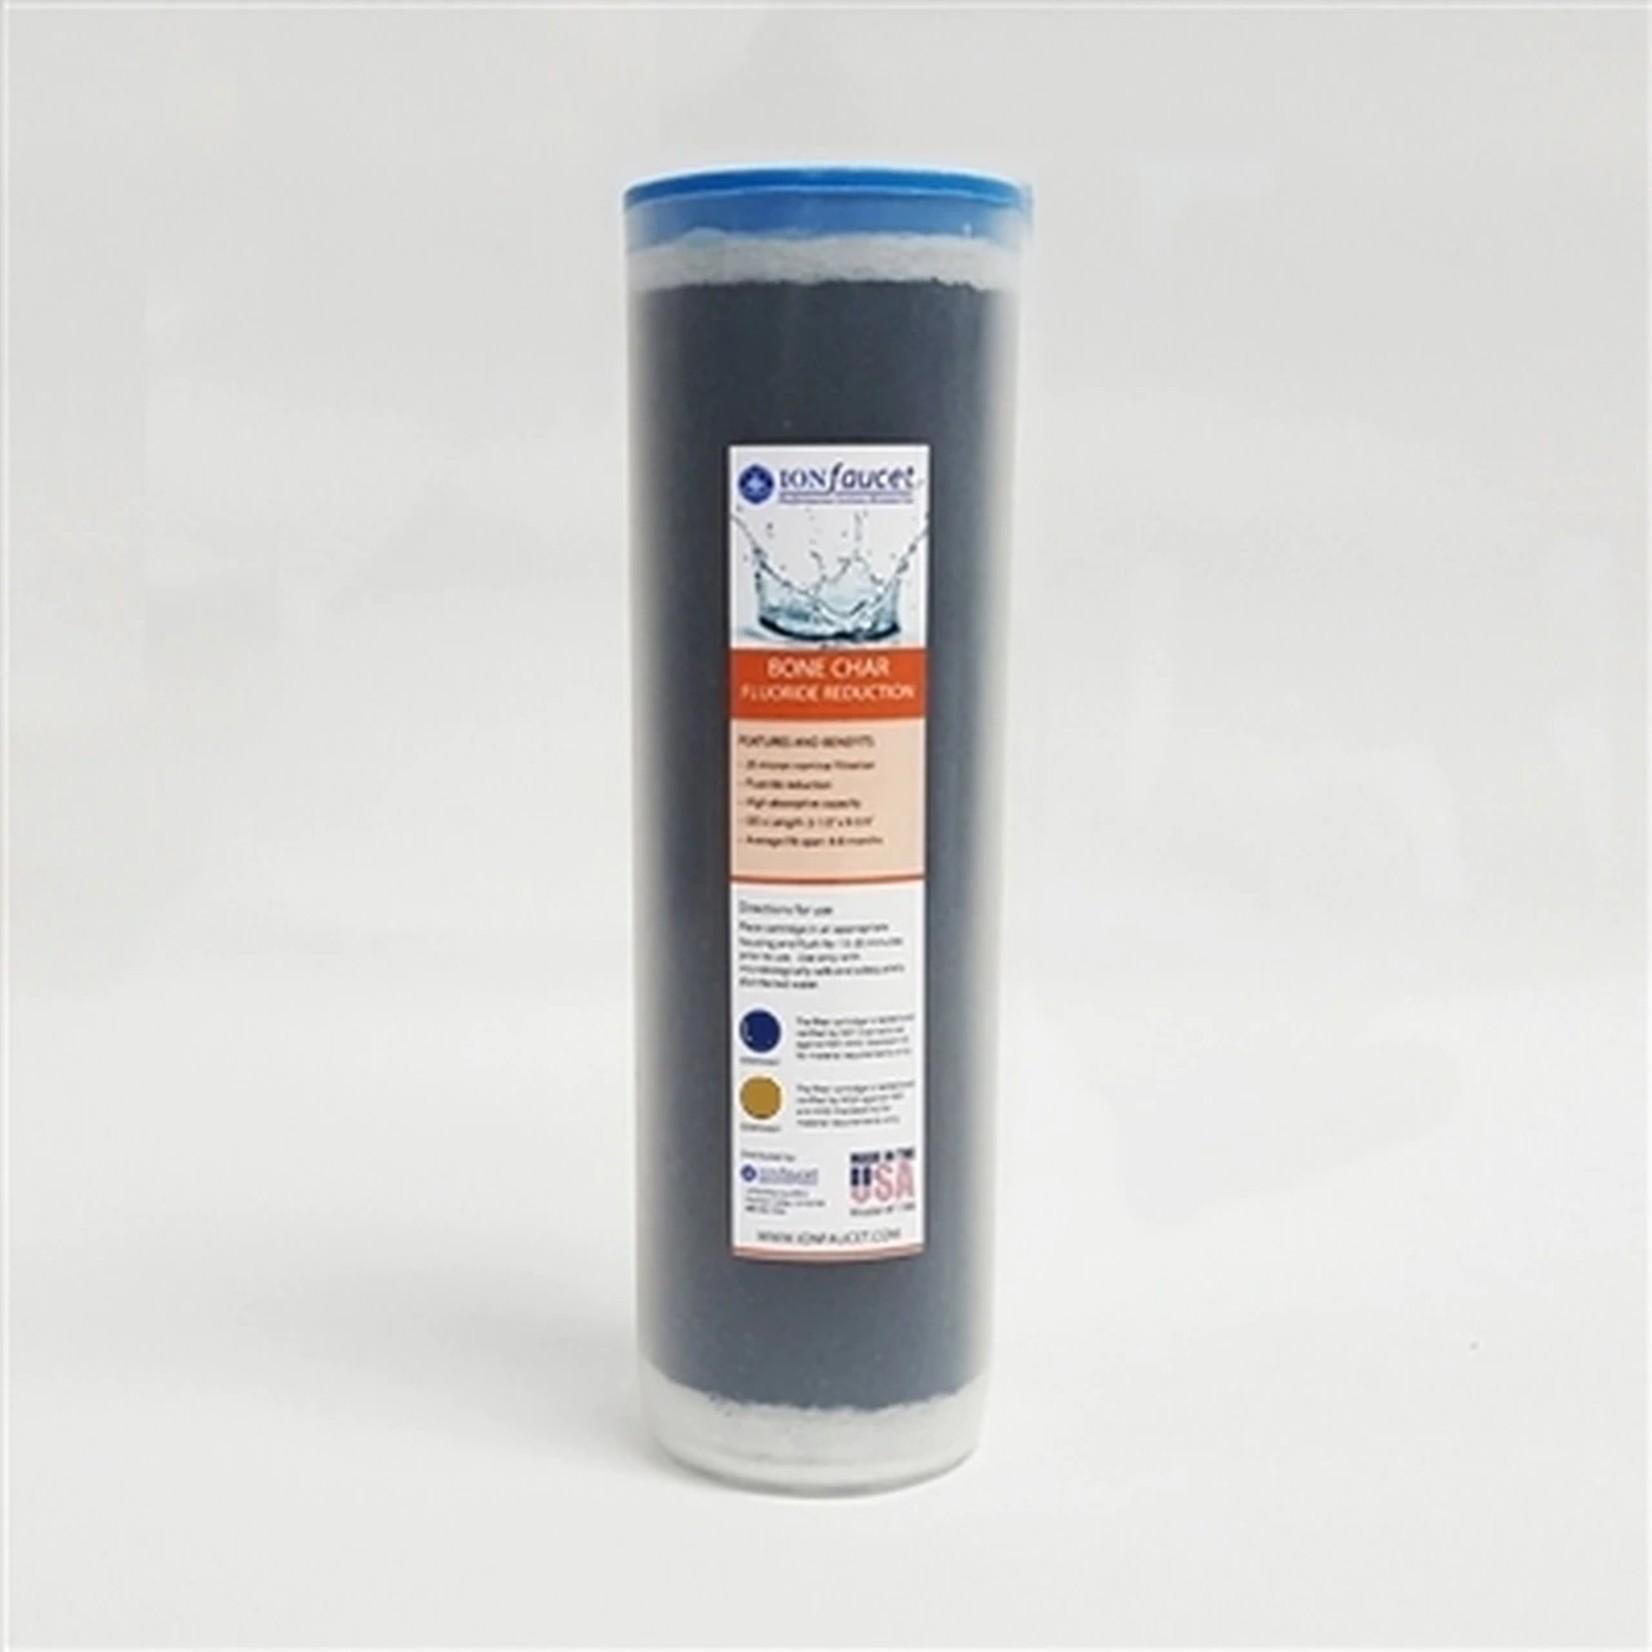 Ionfaucet IonFaucet Bone Char Fluoride Reduction Cartridge Filter